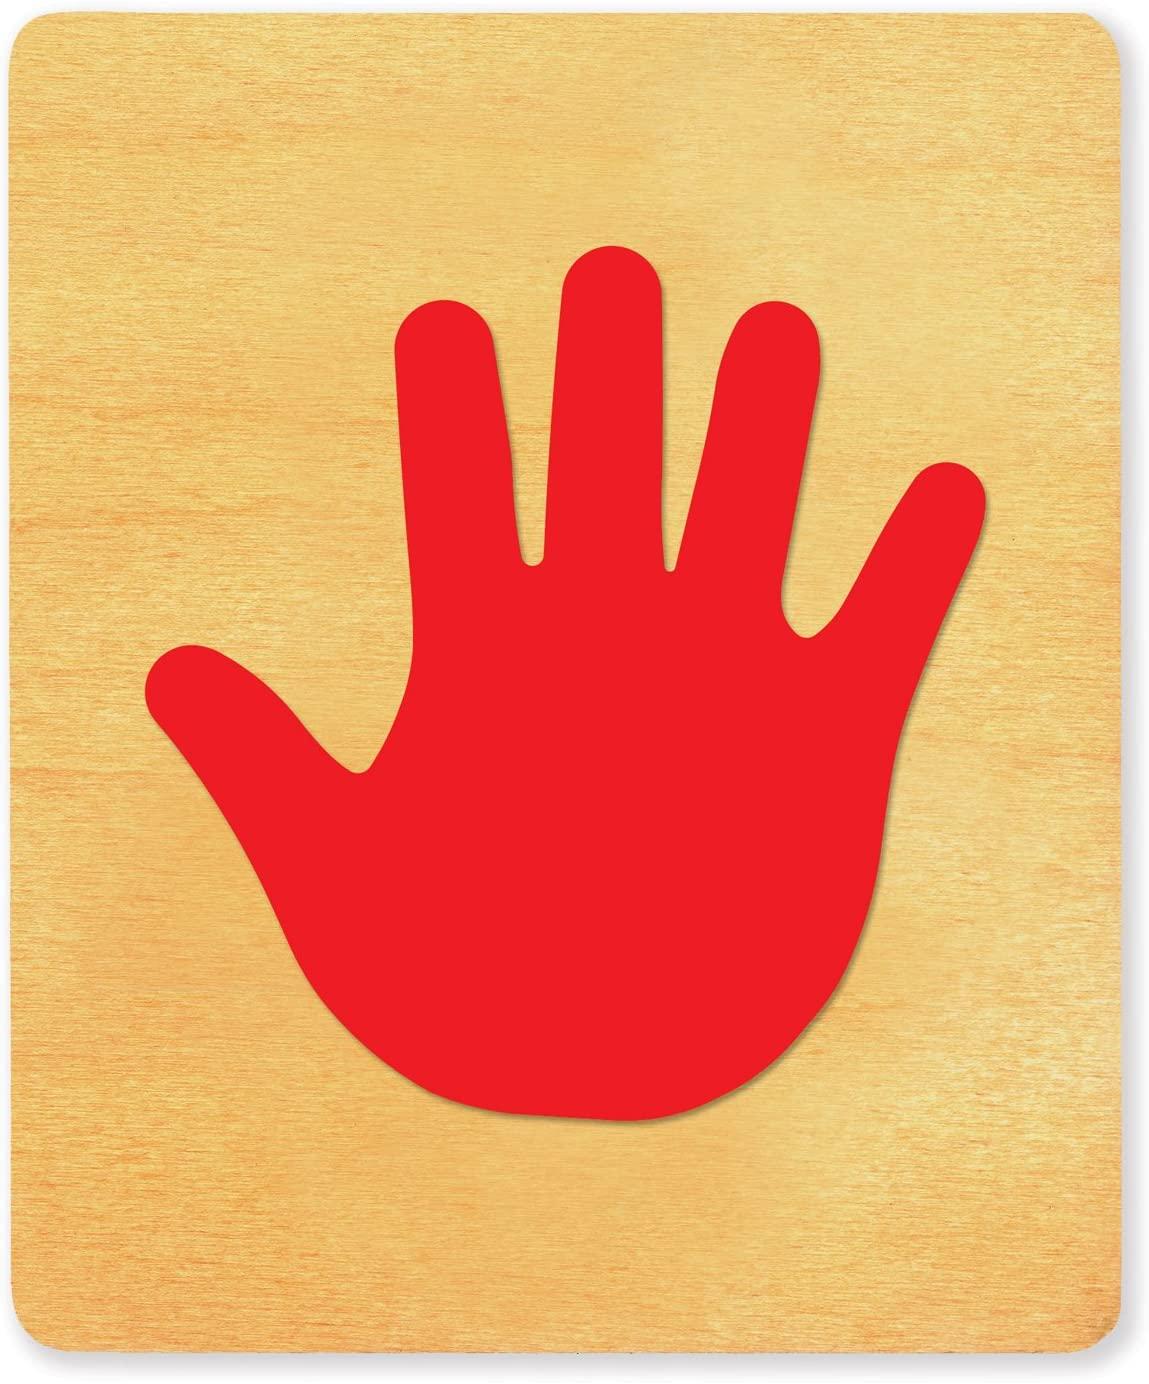 Ellison SureCut 21758-LG, Child Handprint Basic Beginnings, 5 7/8